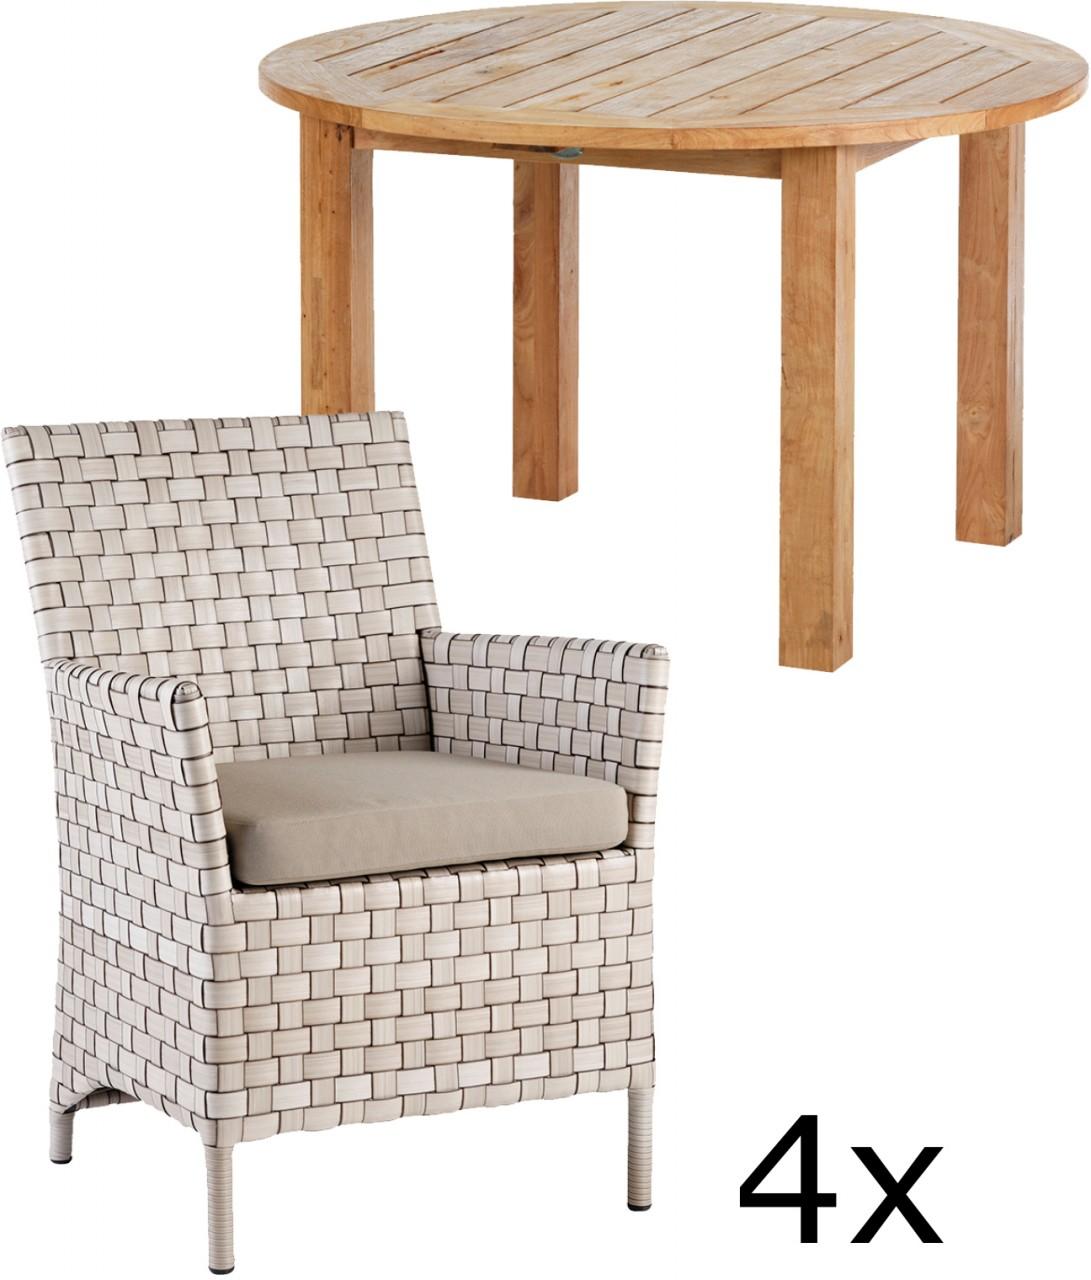 geflecht gartenmoebel set preis vergleich 2016. Black Bedroom Furniture Sets. Home Design Ideas